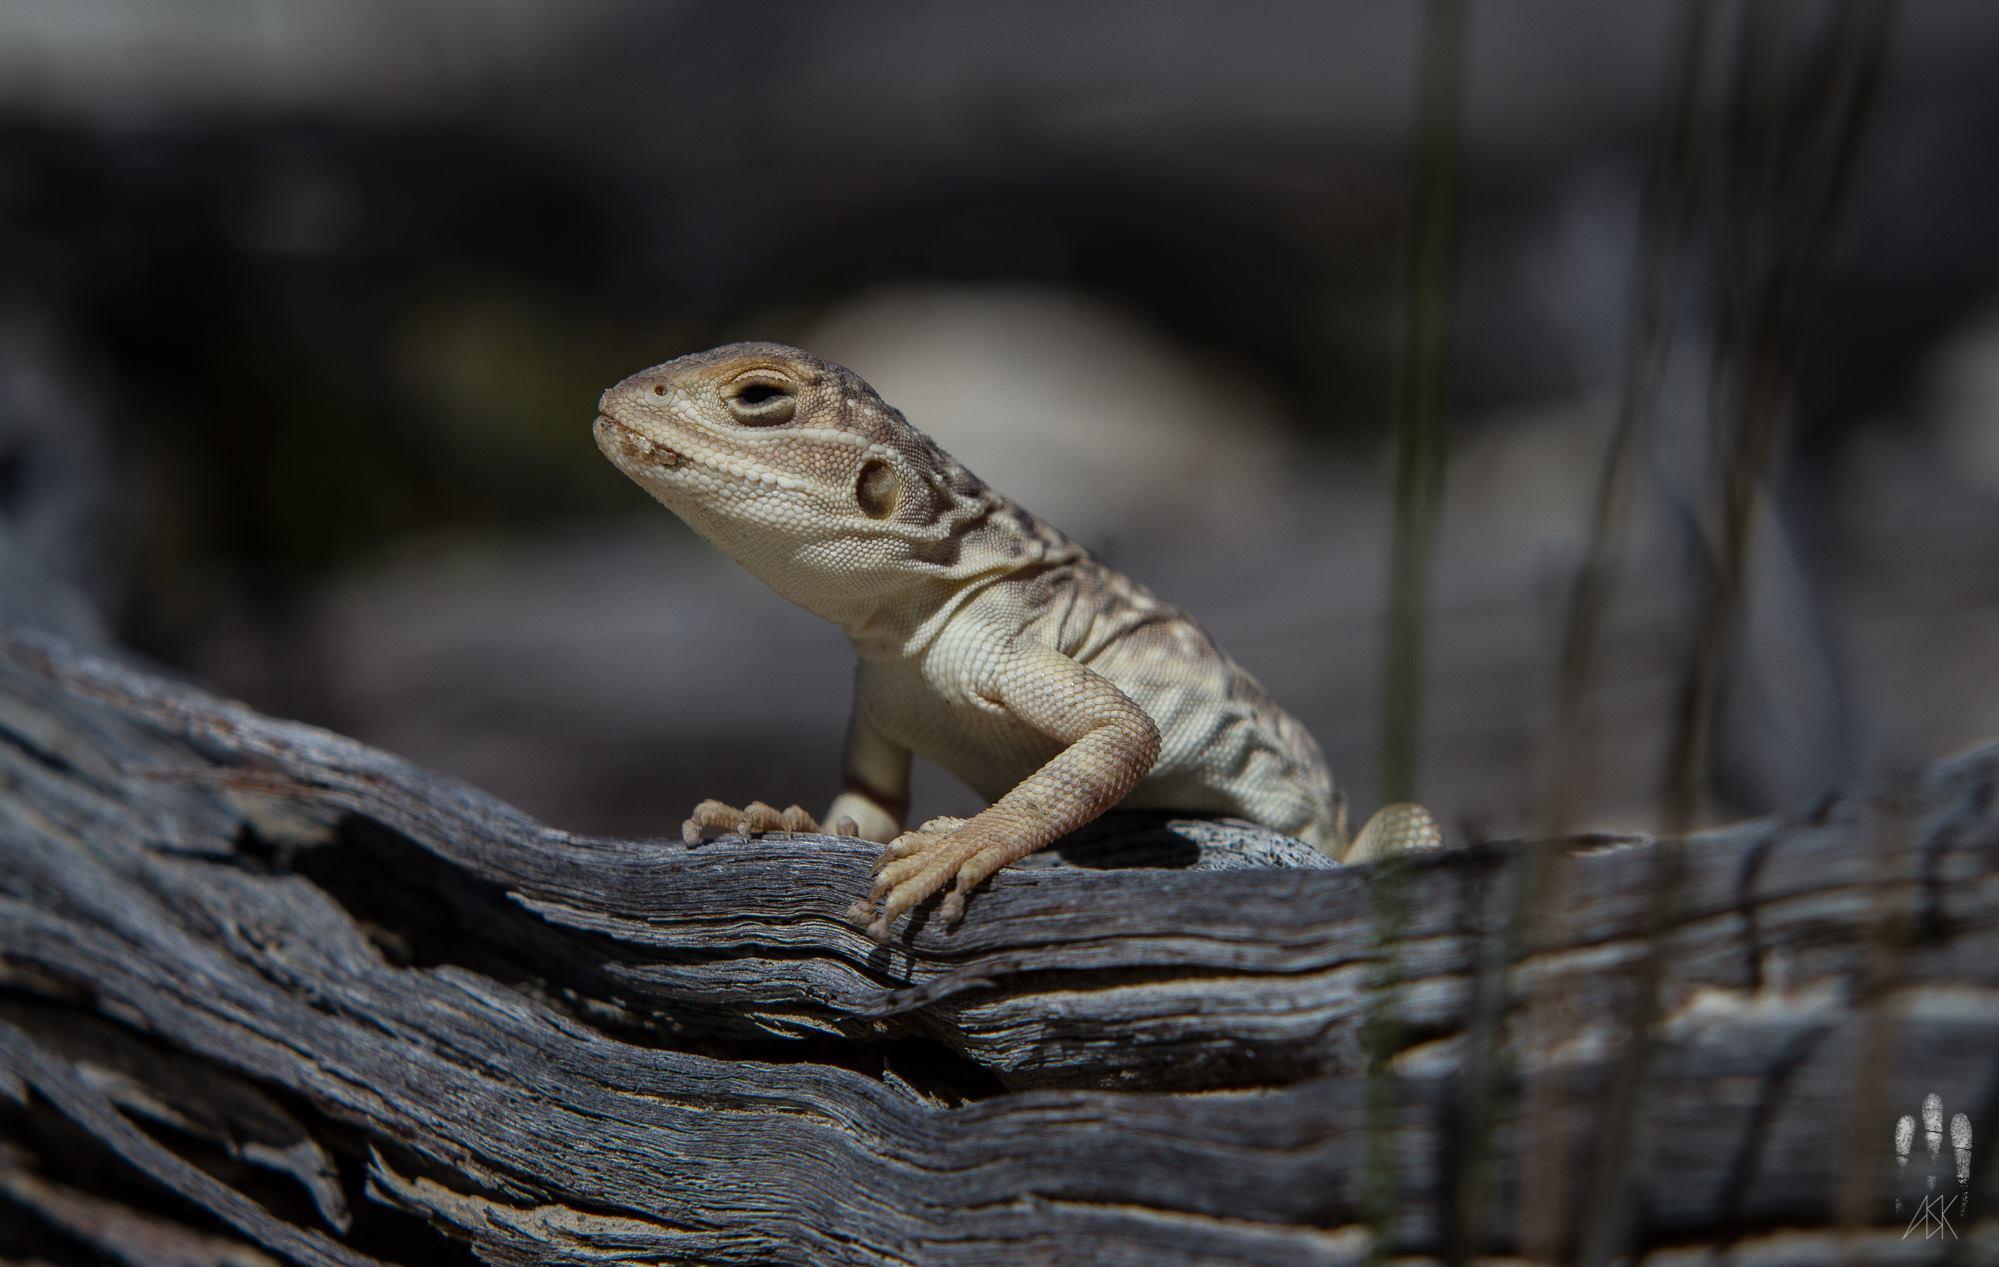 Female claypan dragon, Ctenophorus salinarum . Varley, Western Australia, 2013. Photo by Angus Kennedy.